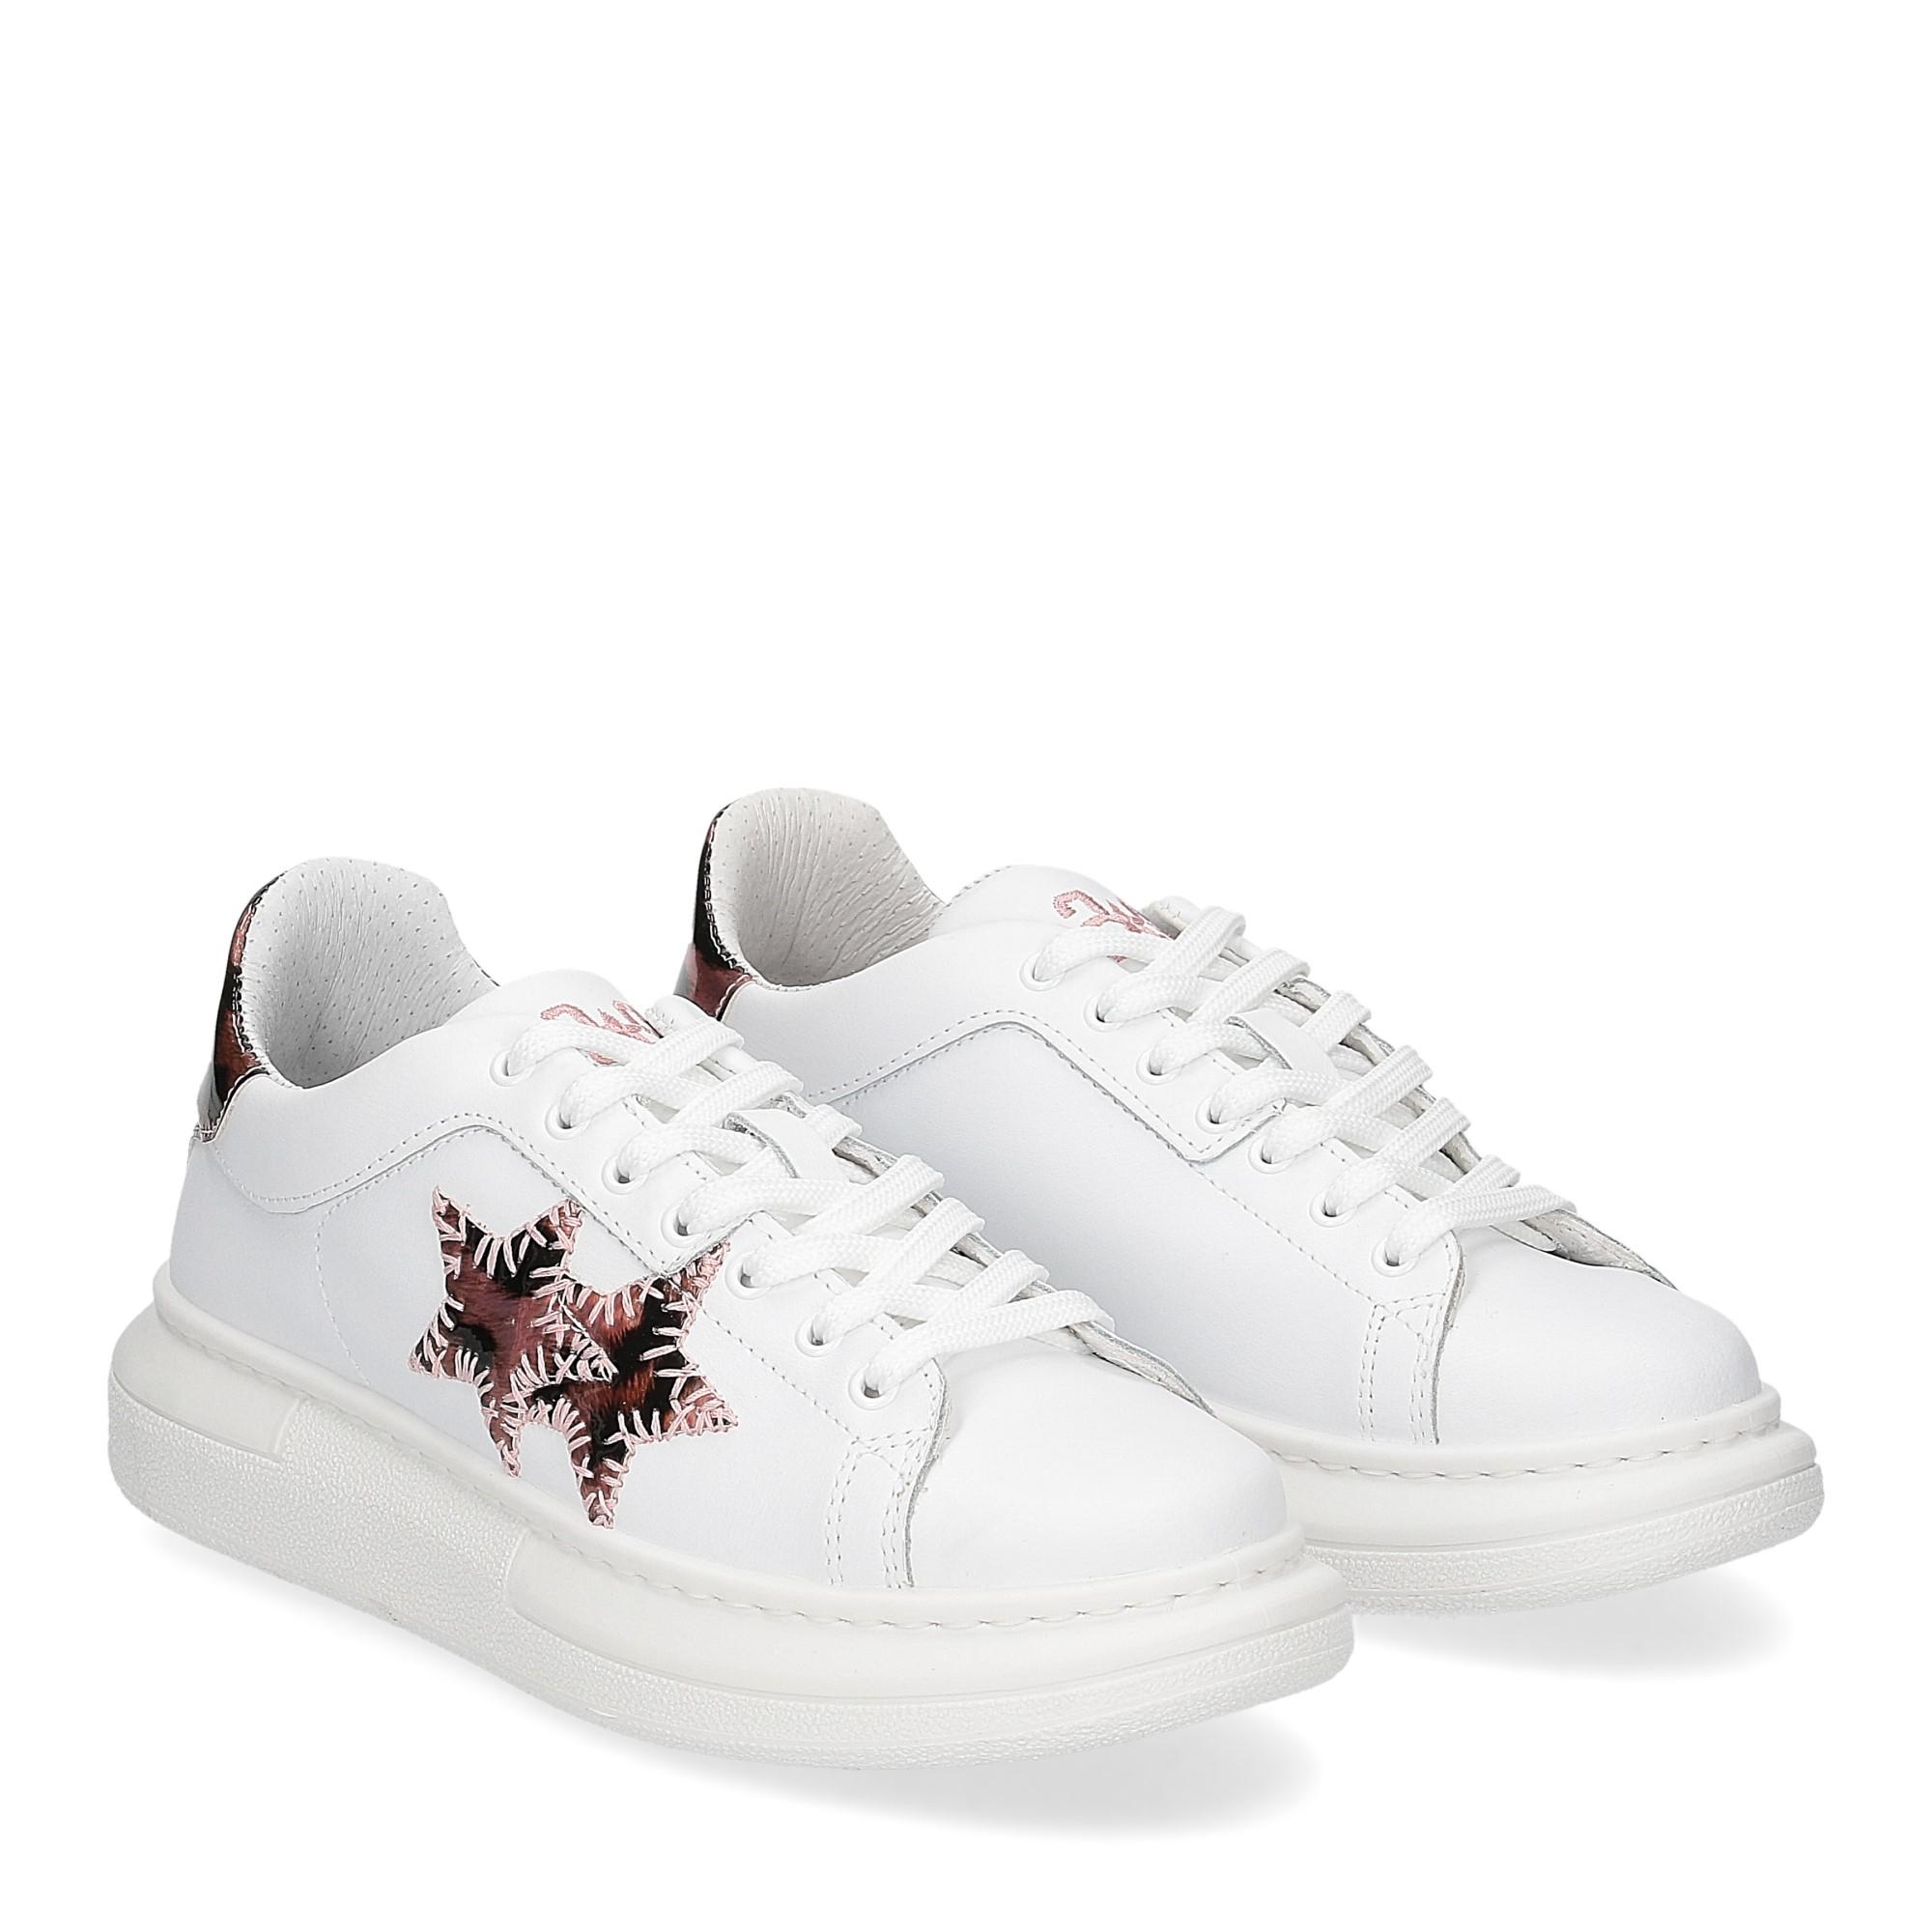 2Star Elettra sneaker bianco maculato rosa